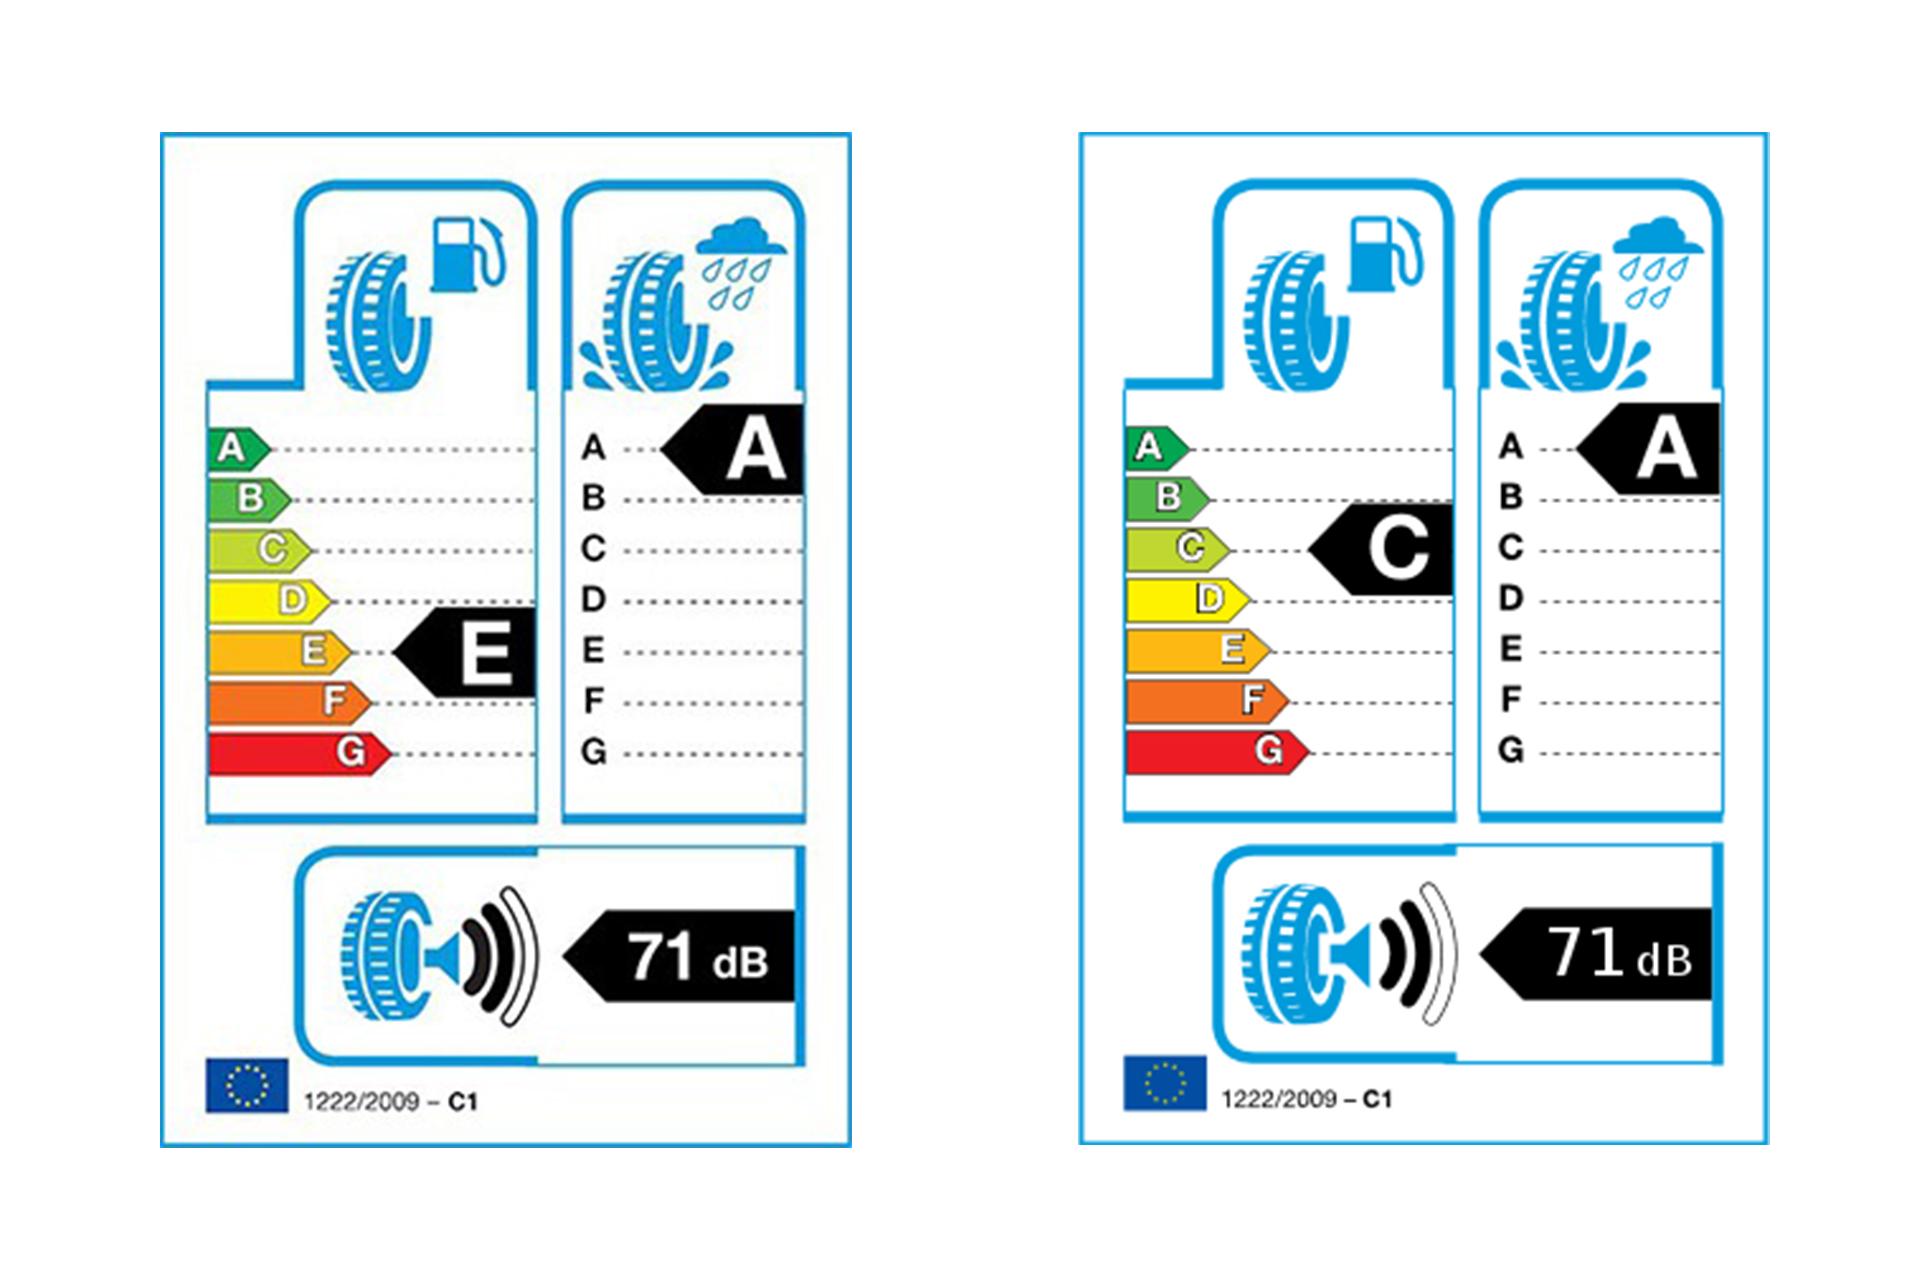 Foto: EU-Reifenlabel für Michelin Pilot Super Sport 245/35 ZR 21 96 Y und Michelin Pilot Super Sport 265/35 ZR 21 102 Y